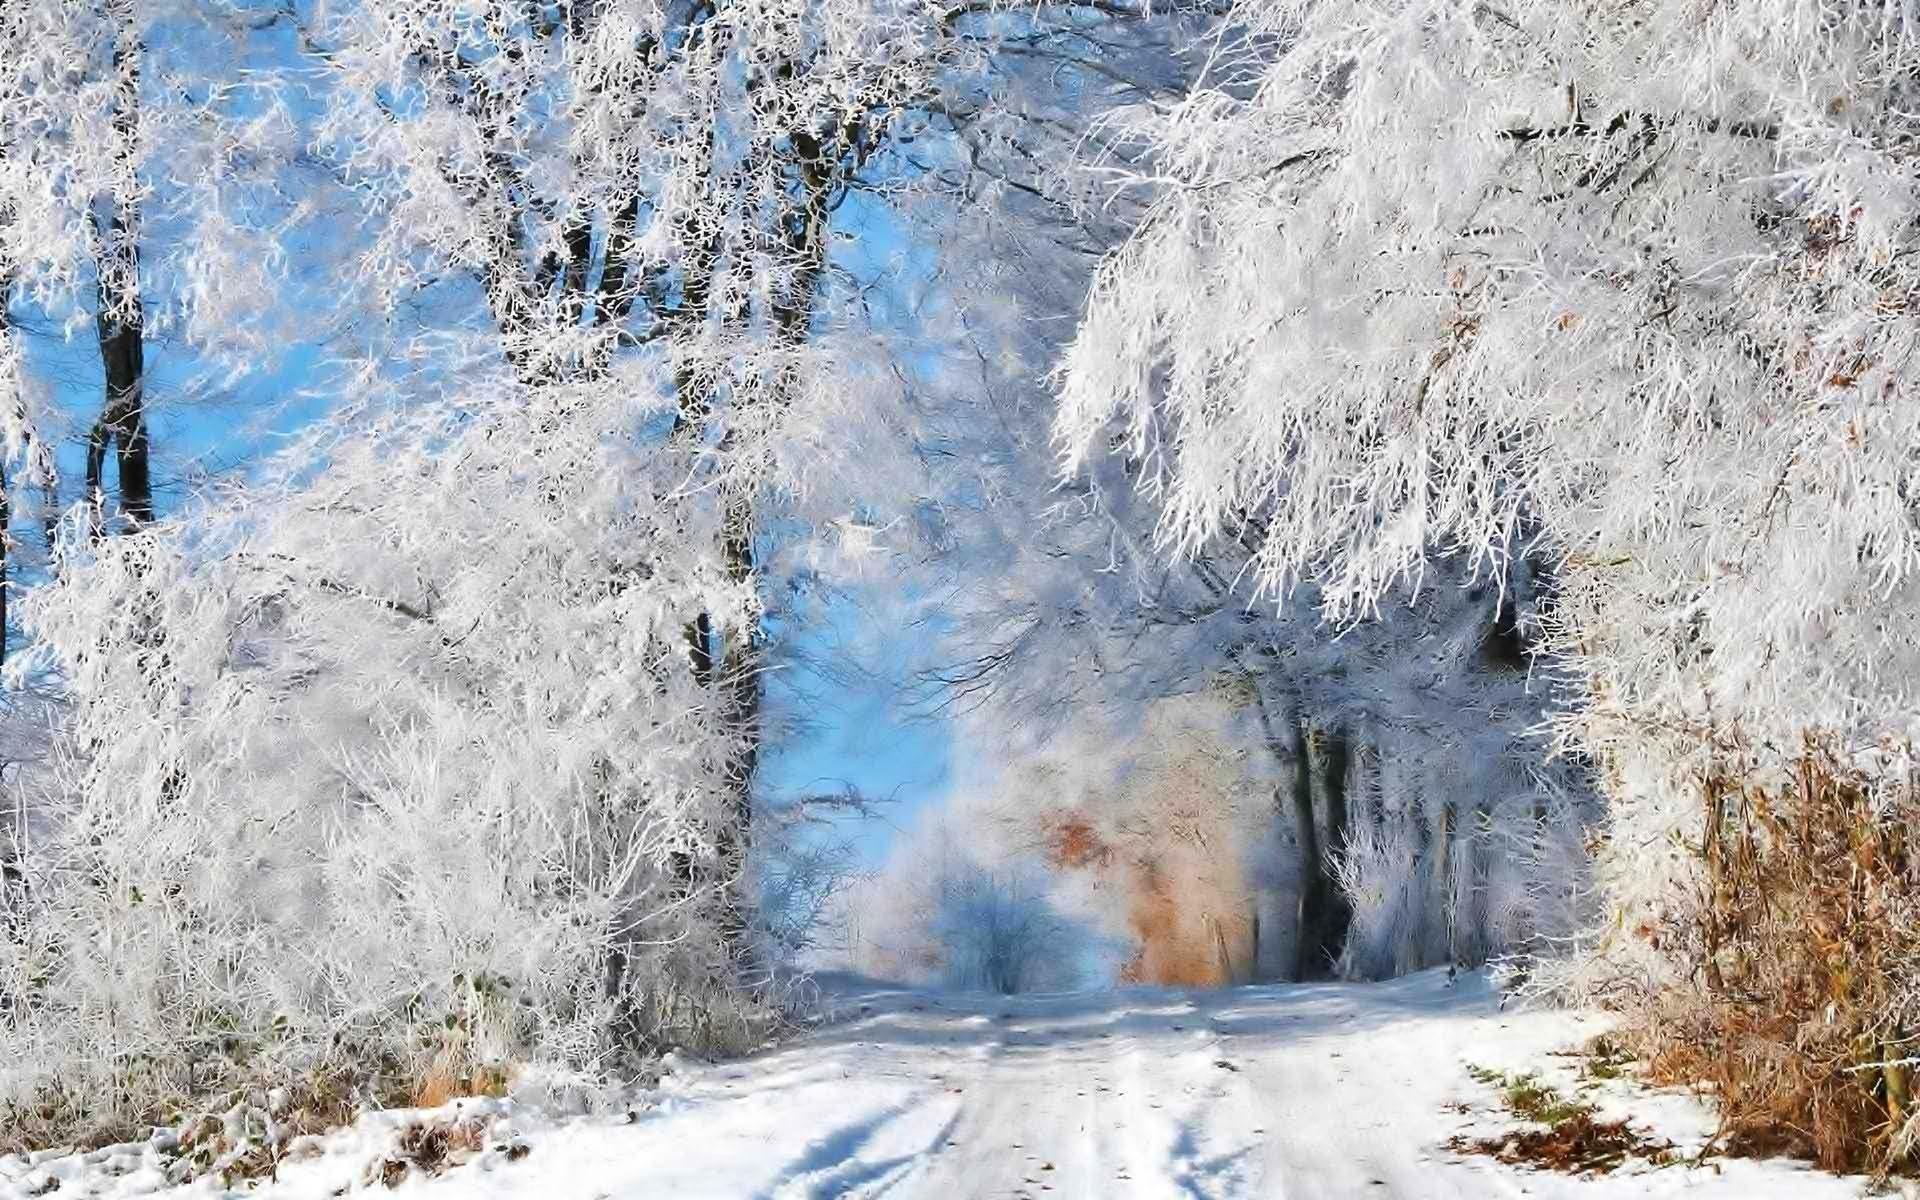 Зима лес деревья снег иней дорога